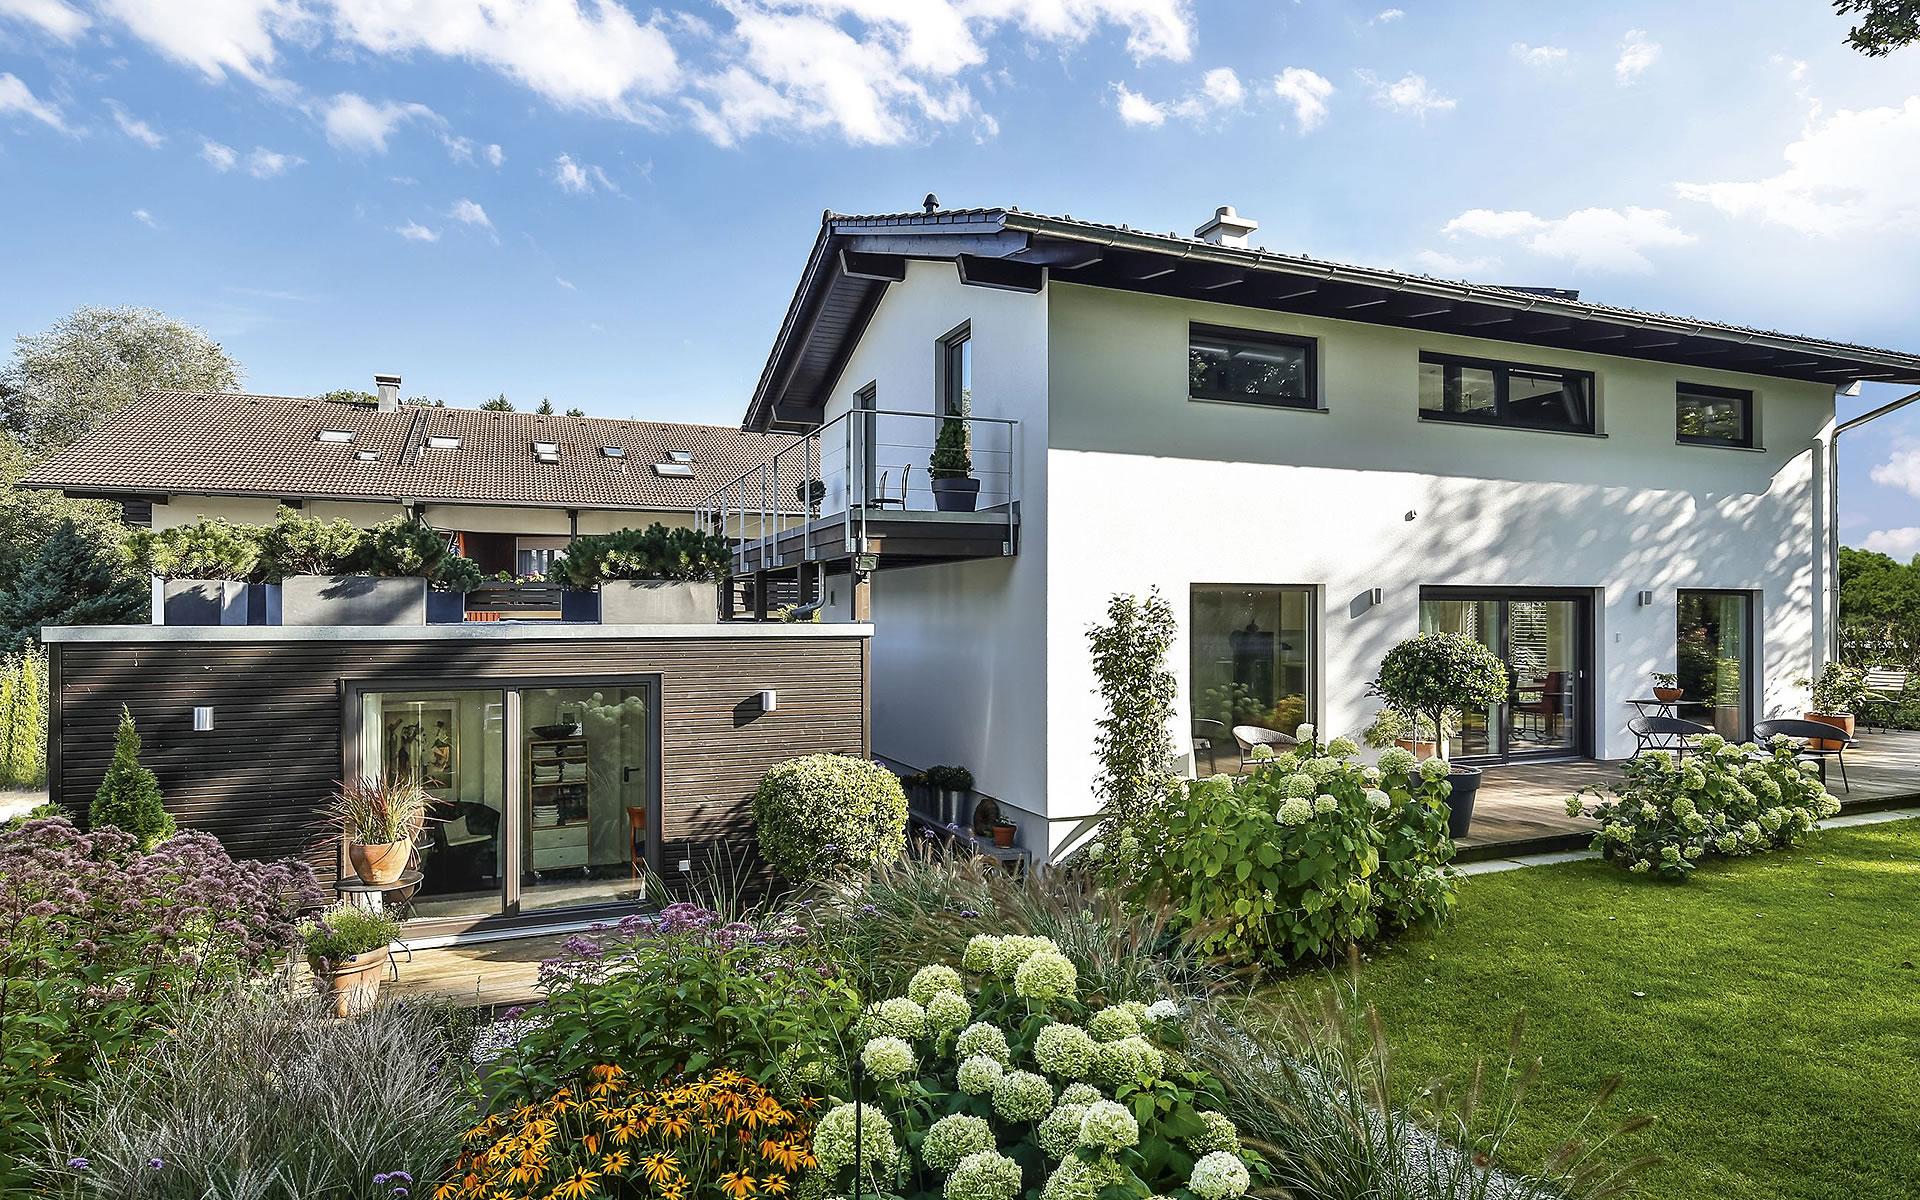 Bad Endorf von Regnauer Hausbau GmbH & Co. KG